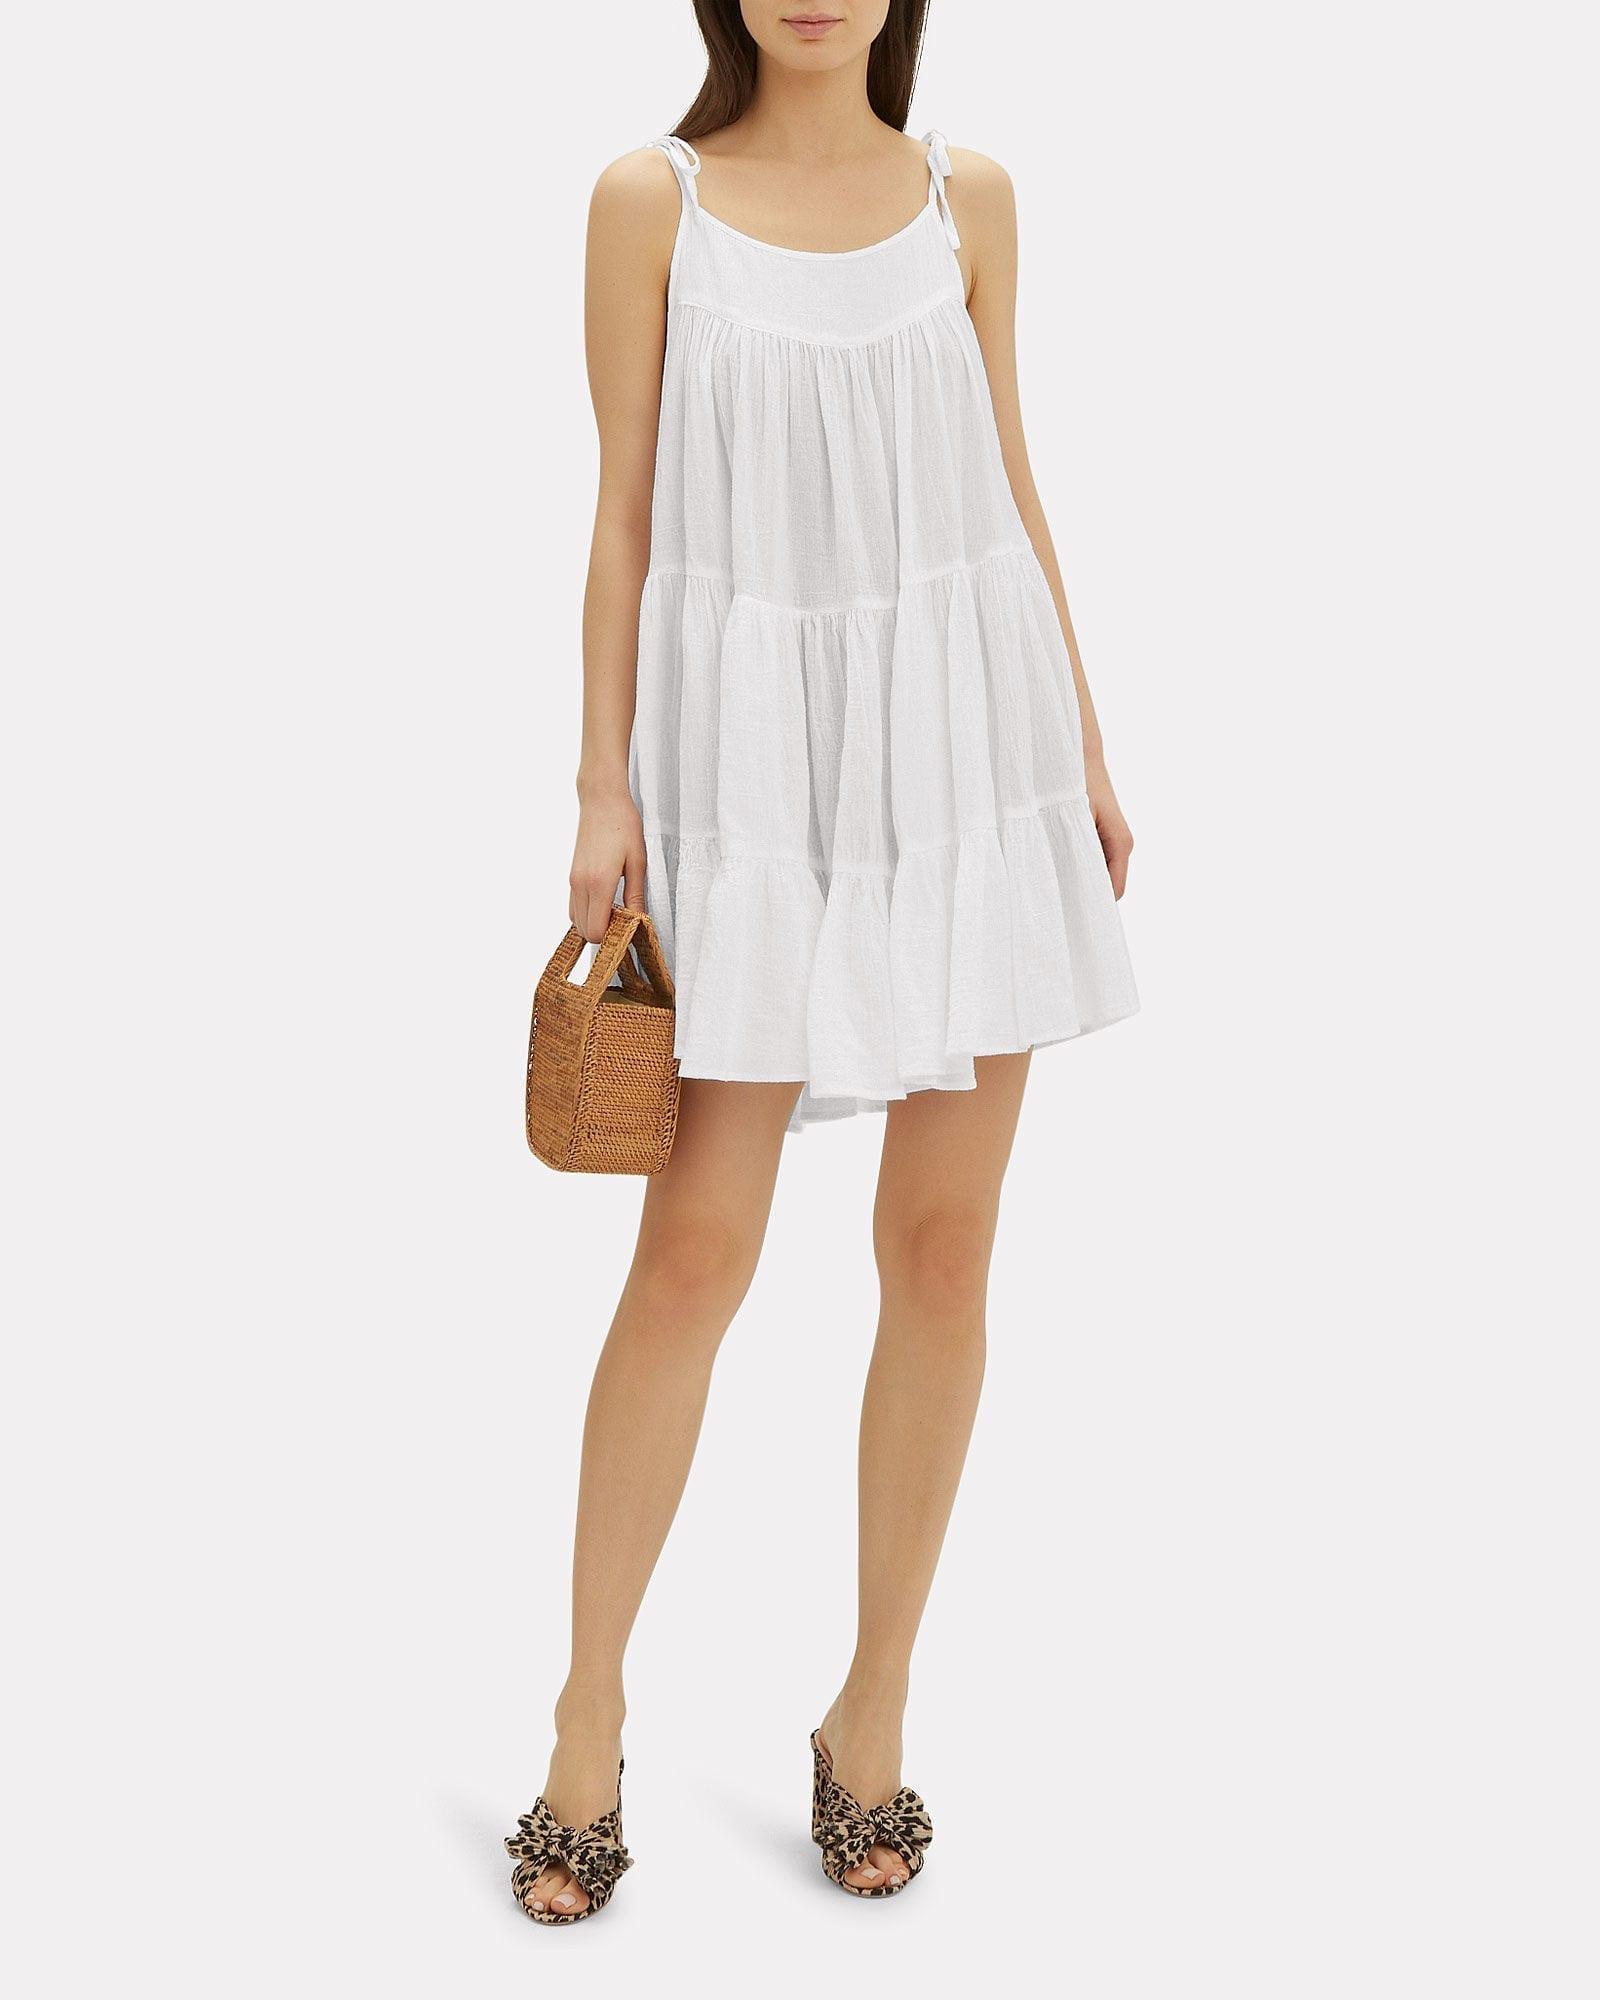 HONORINE Peri Mini Dress